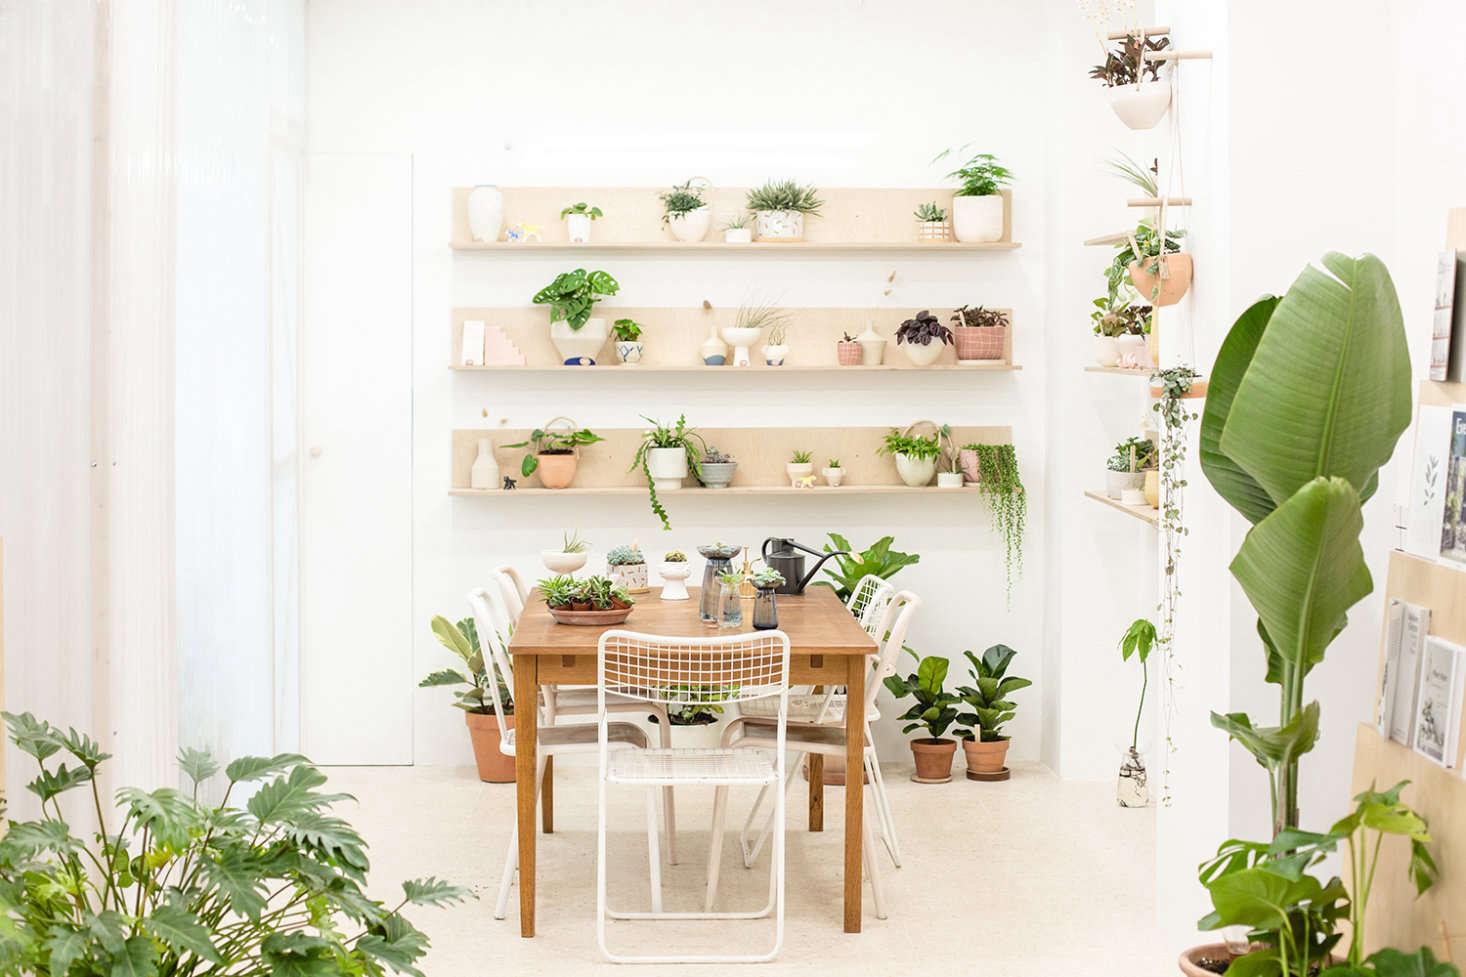 Leaf Shop Vegetal In Paris Houseplants For Sale Canal St